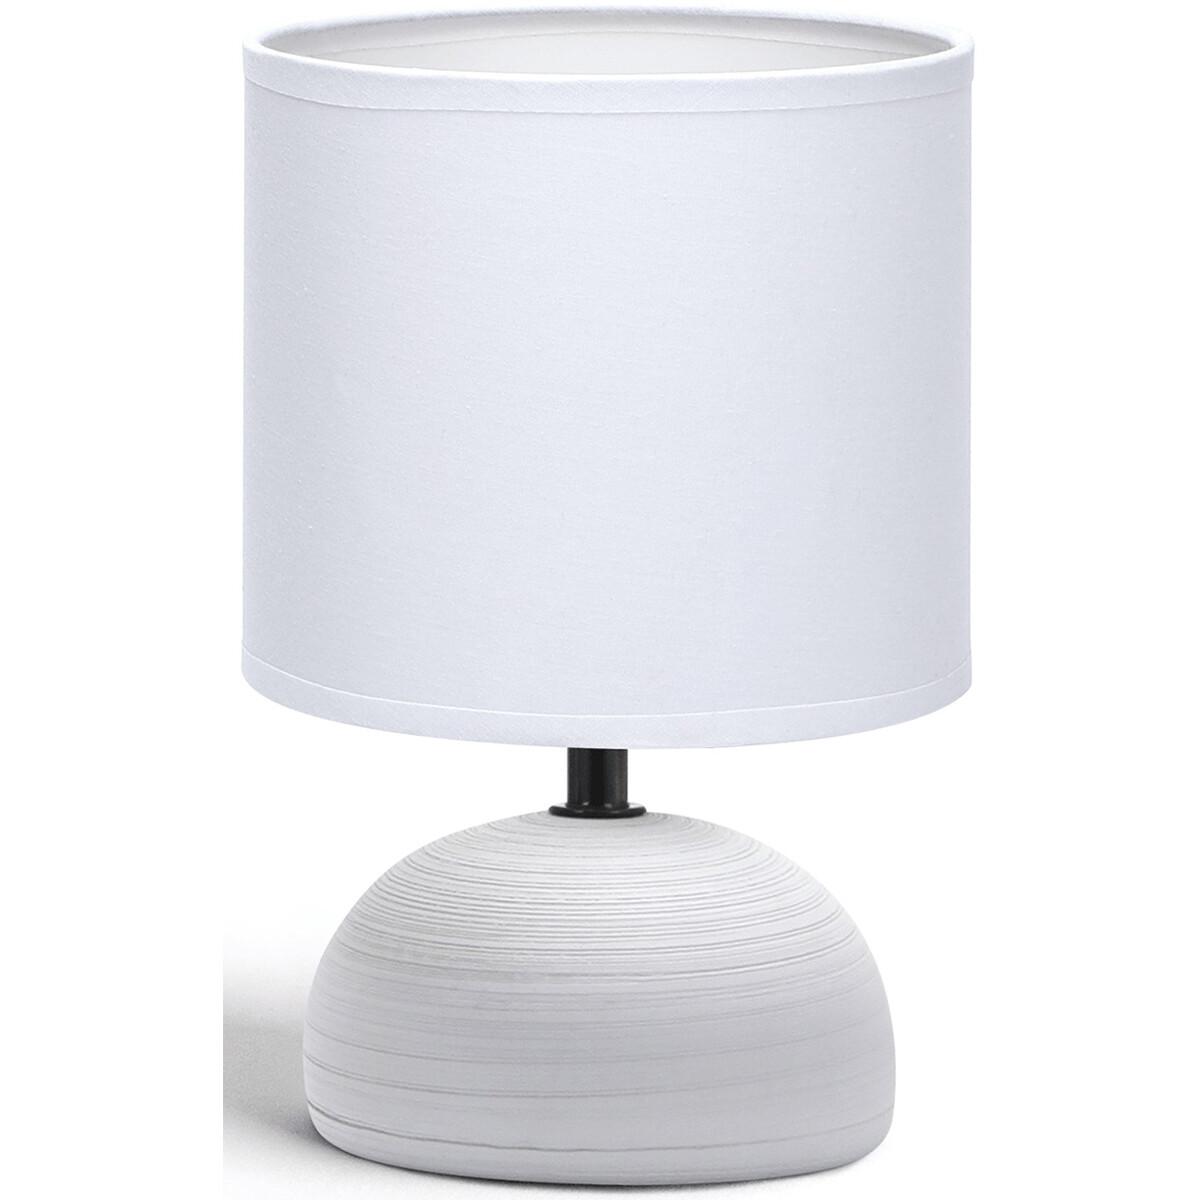 LED Tafellamp - Tafelverlichting - Aigi Conton 2 - E14 Fitting - Rond - Mat Grijs - Keramiek